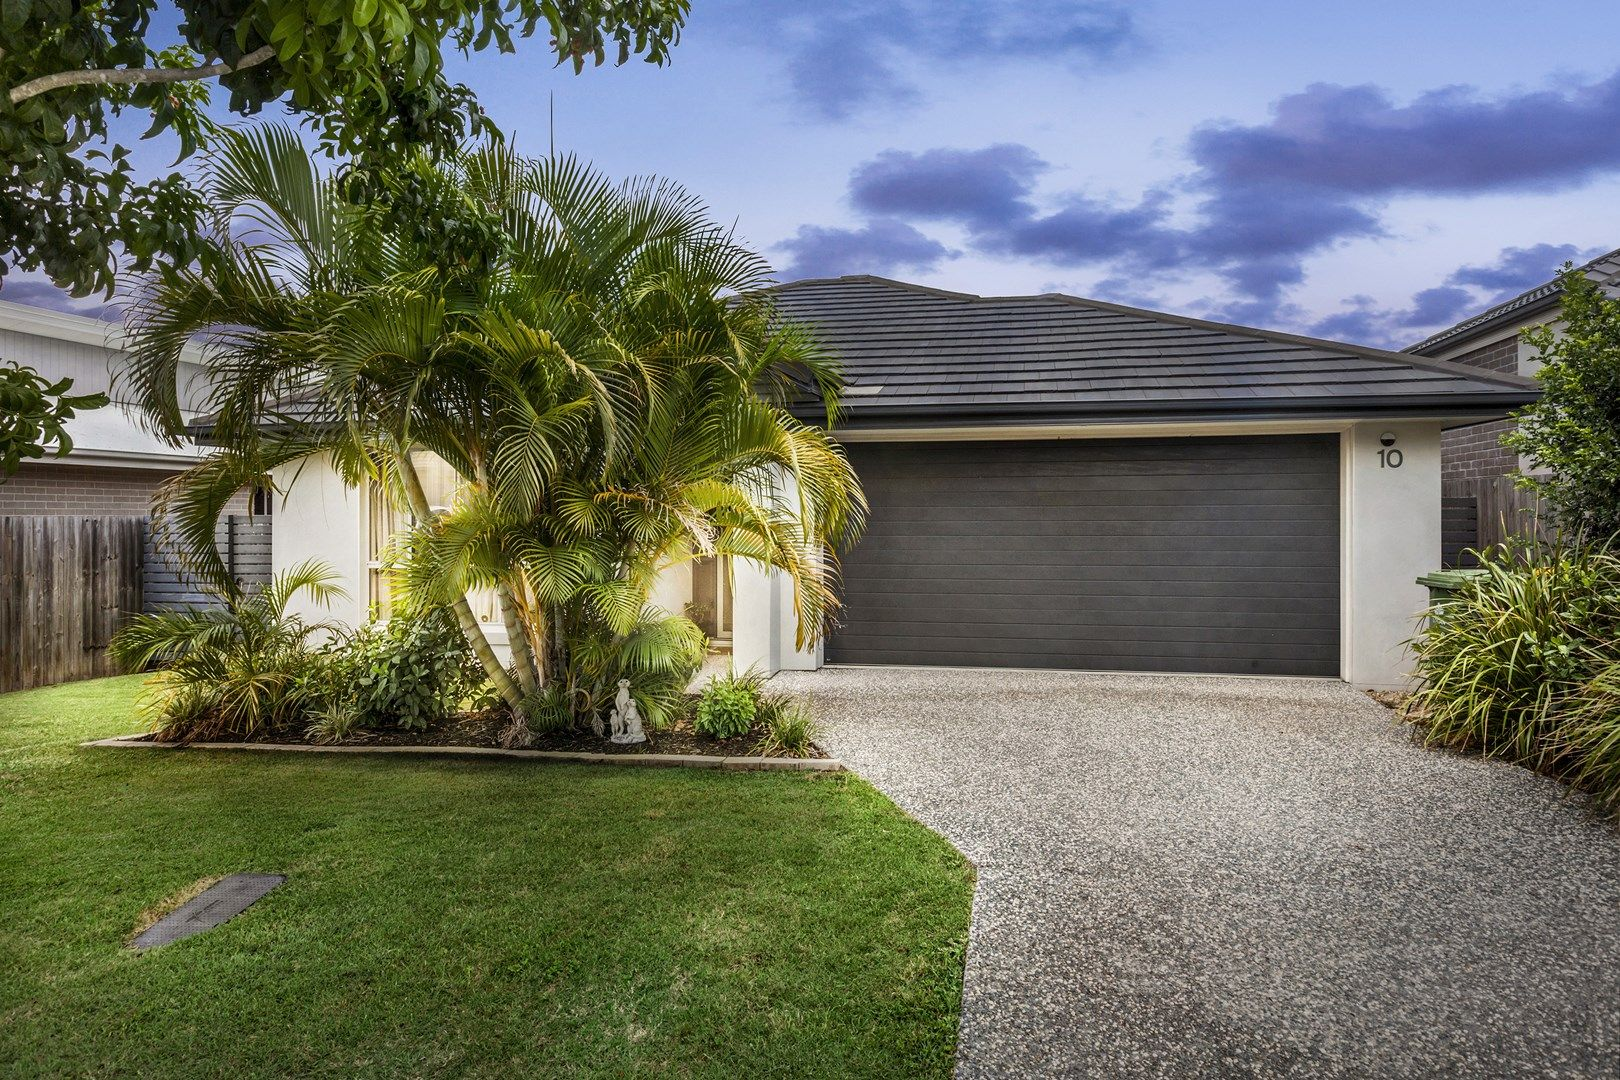 10 Surwold Way, Loganlea QLD 4131, Image 0